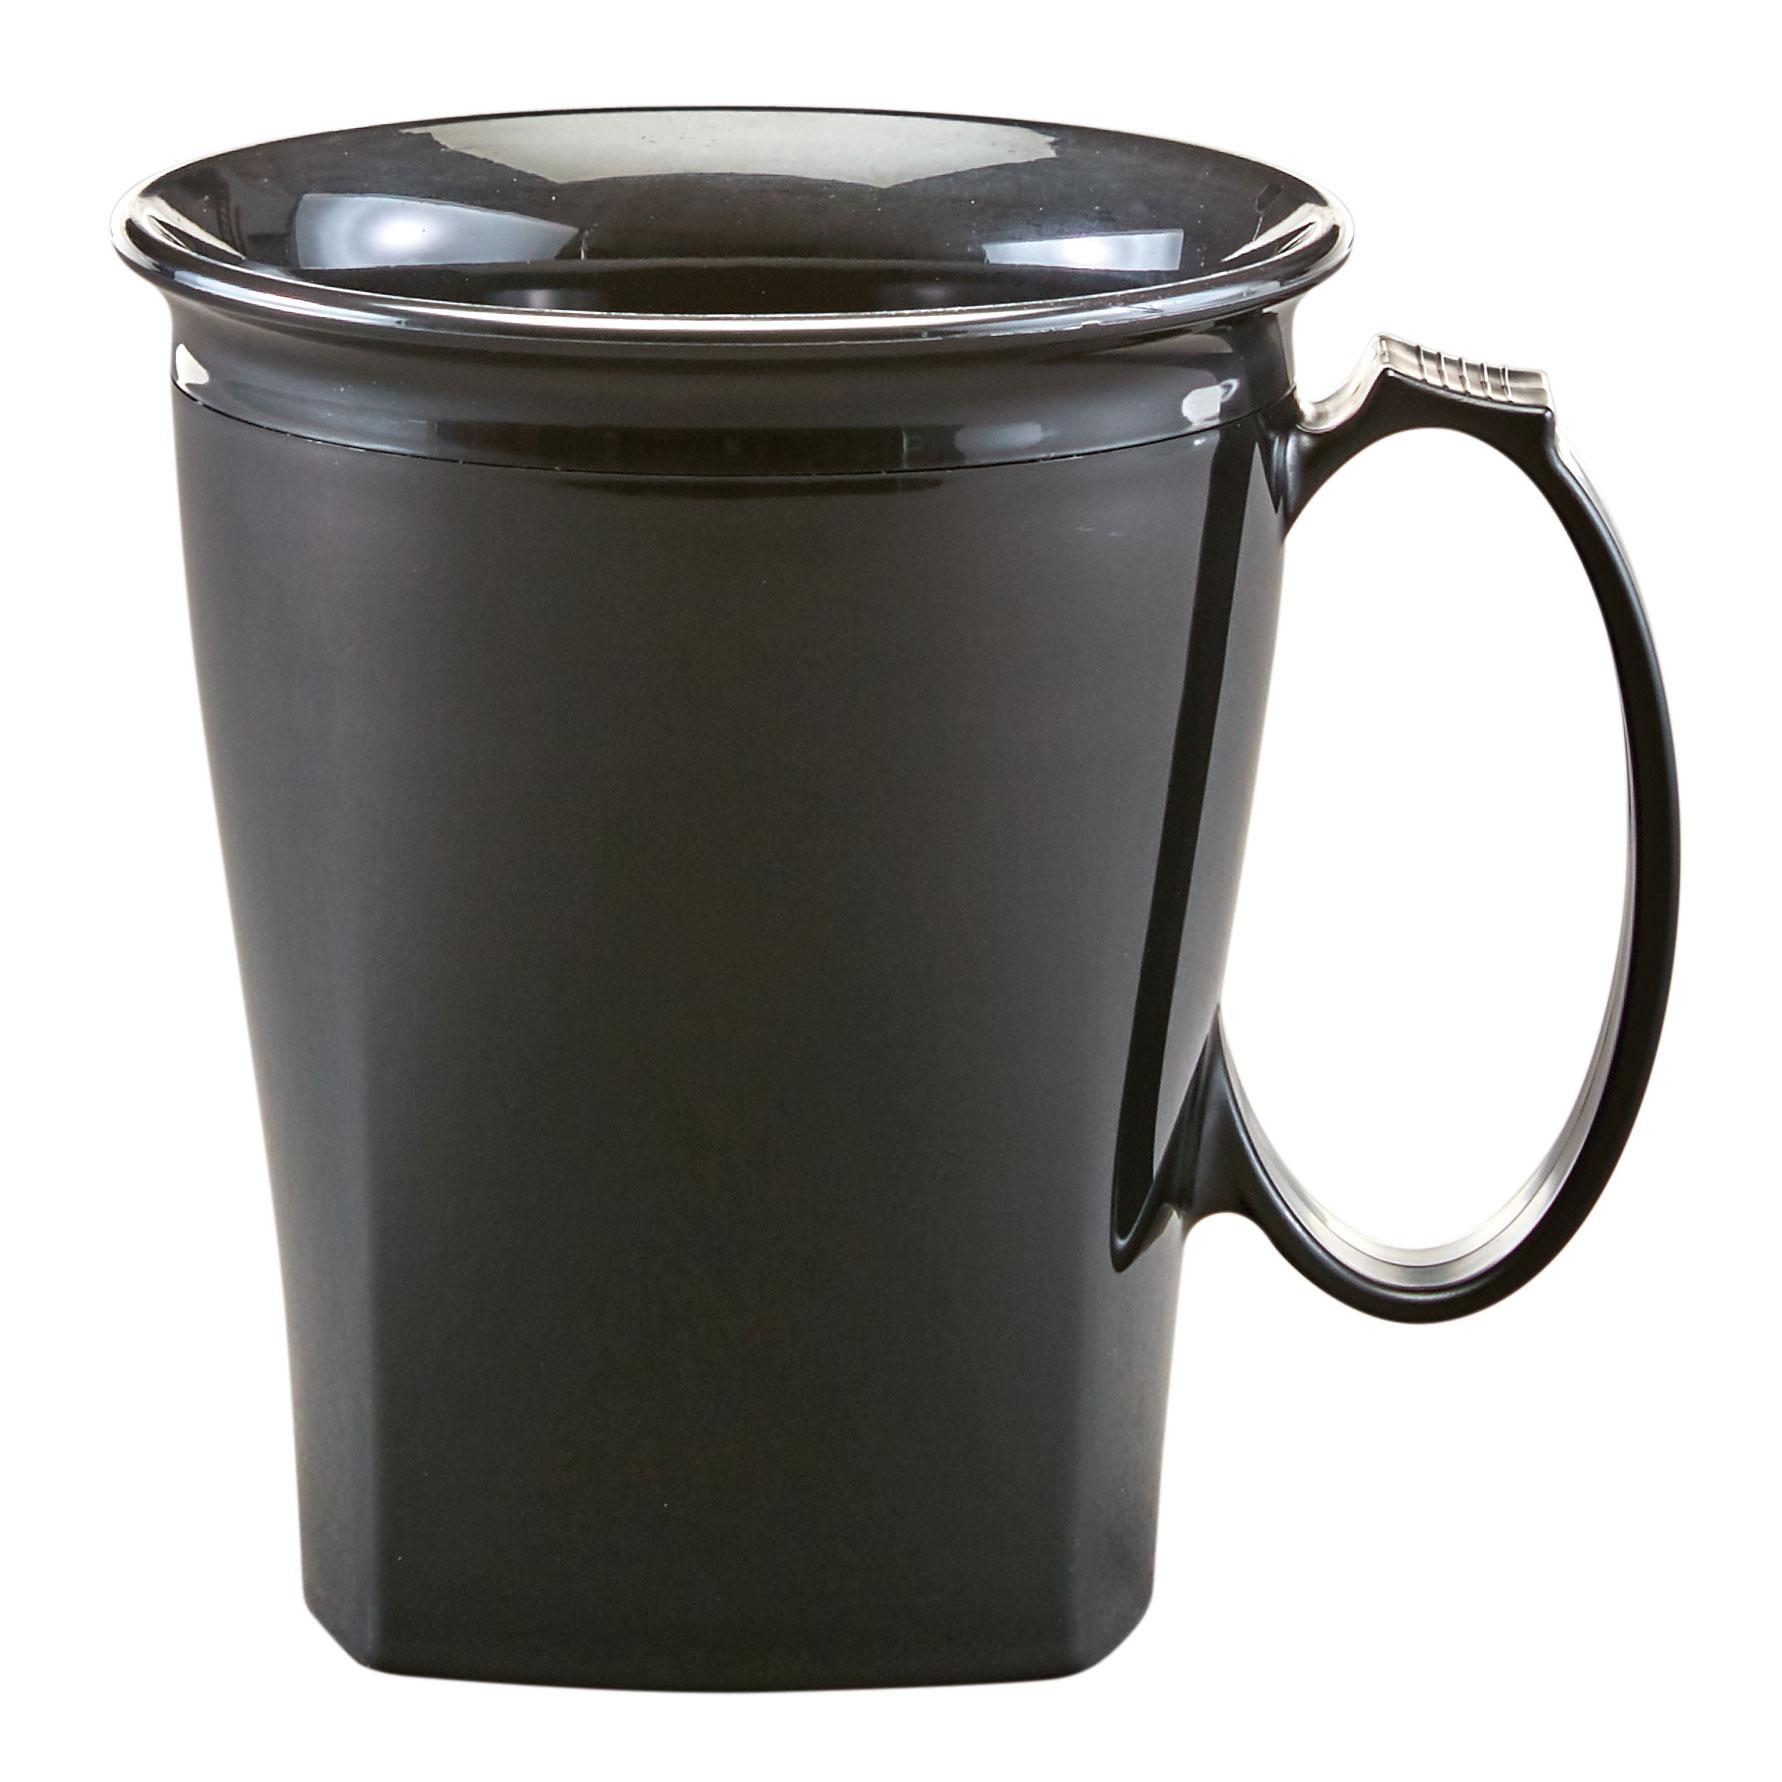 Cambro MDSHM8110 mugs/cups (non disposable)